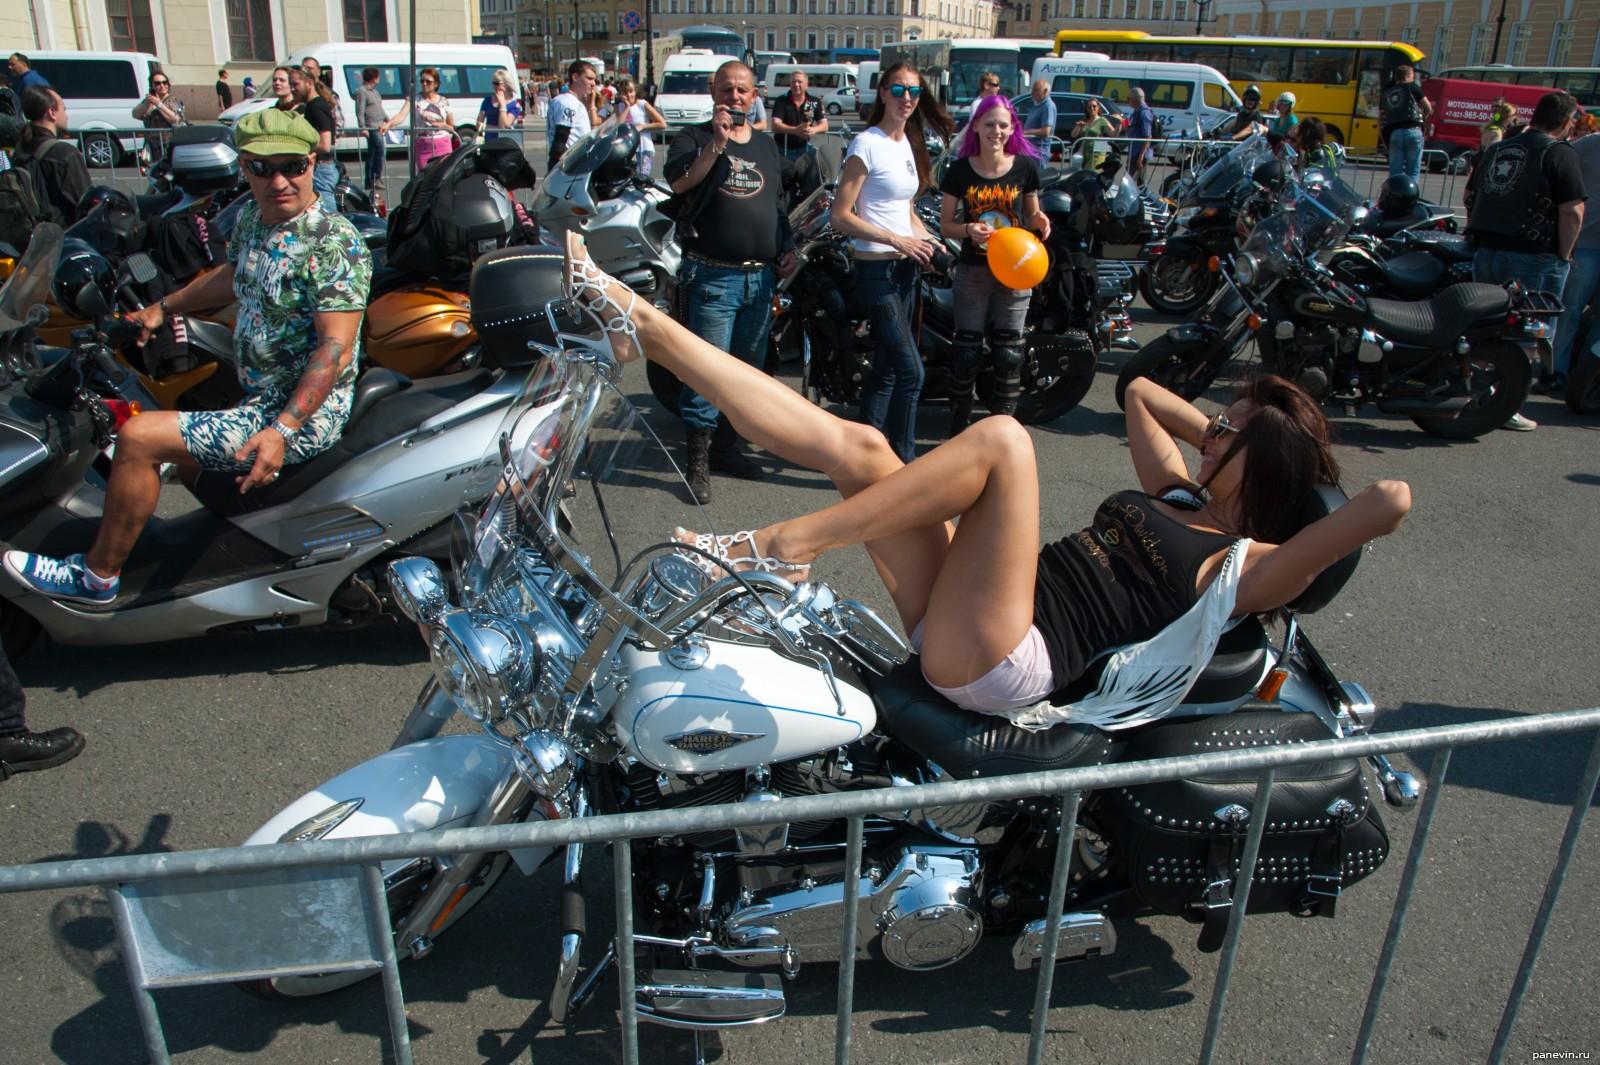 Девушка на байке фото - Дни Harley Davidson - Фотографии ...: http://panevin.ru/photo/harley-days/devushka_na_bayke.html